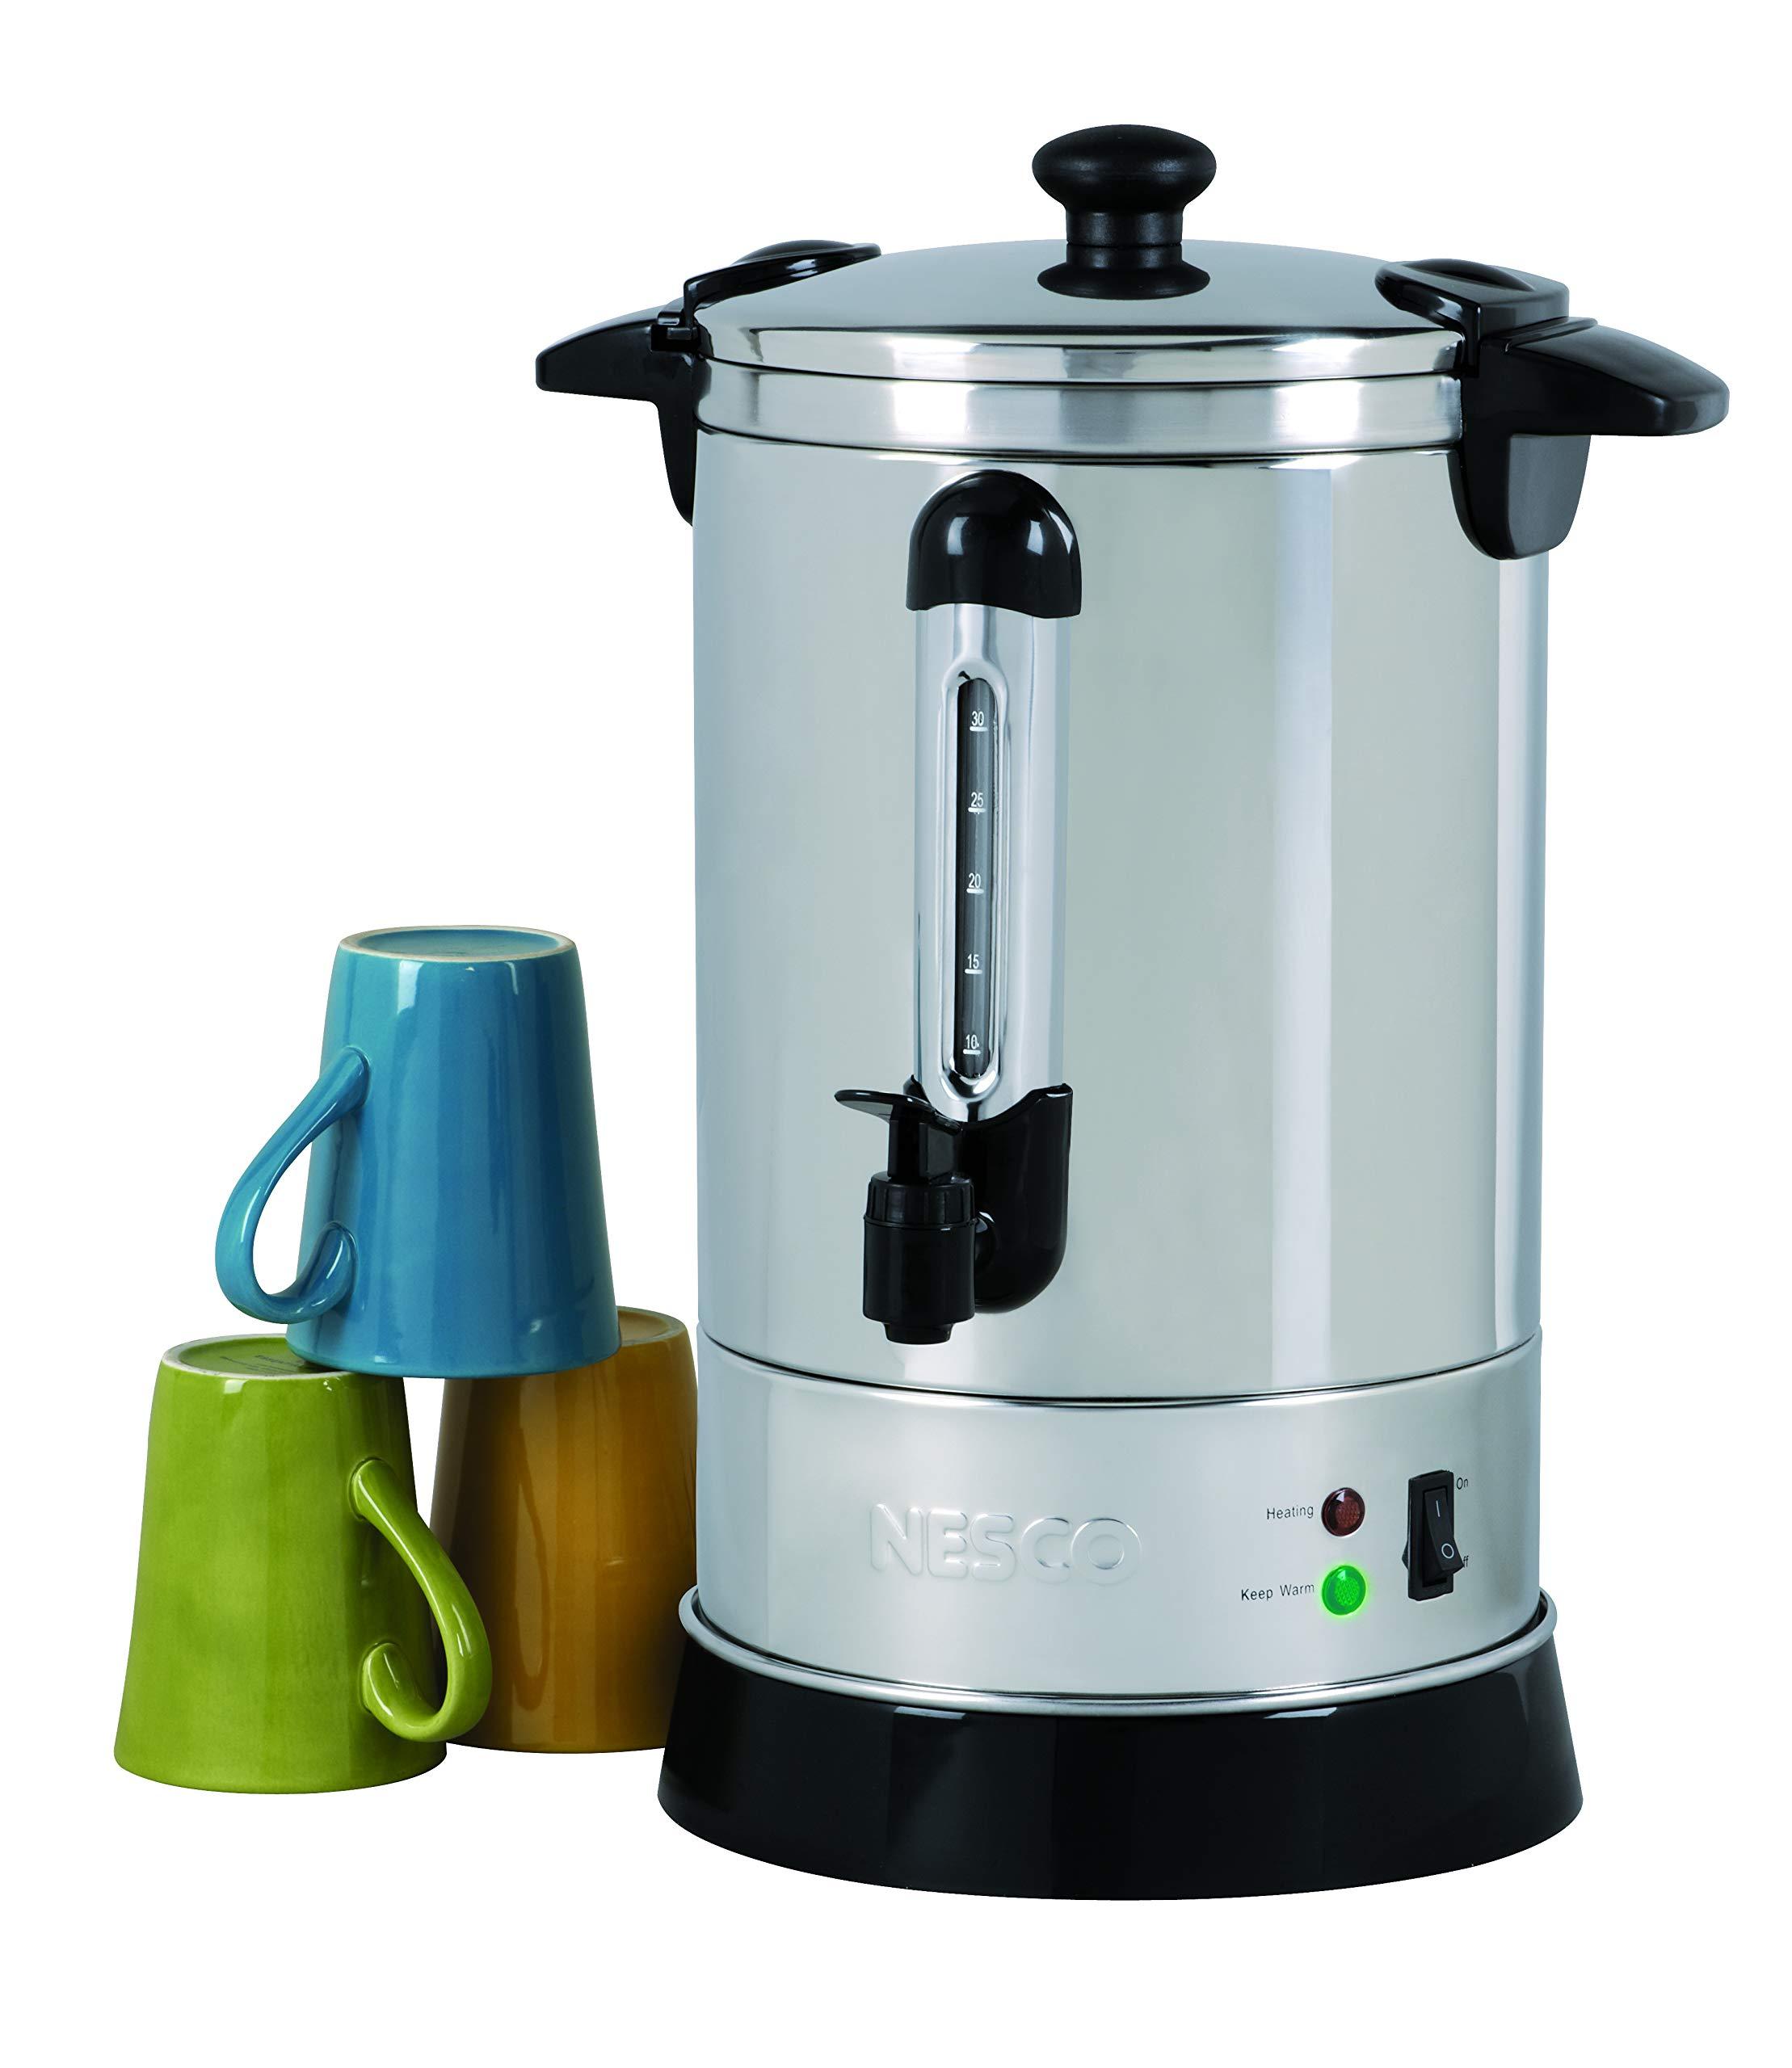 Nesco CU-30 Professional Coffee Urn Stainless Steel by Nesco (Image #7)